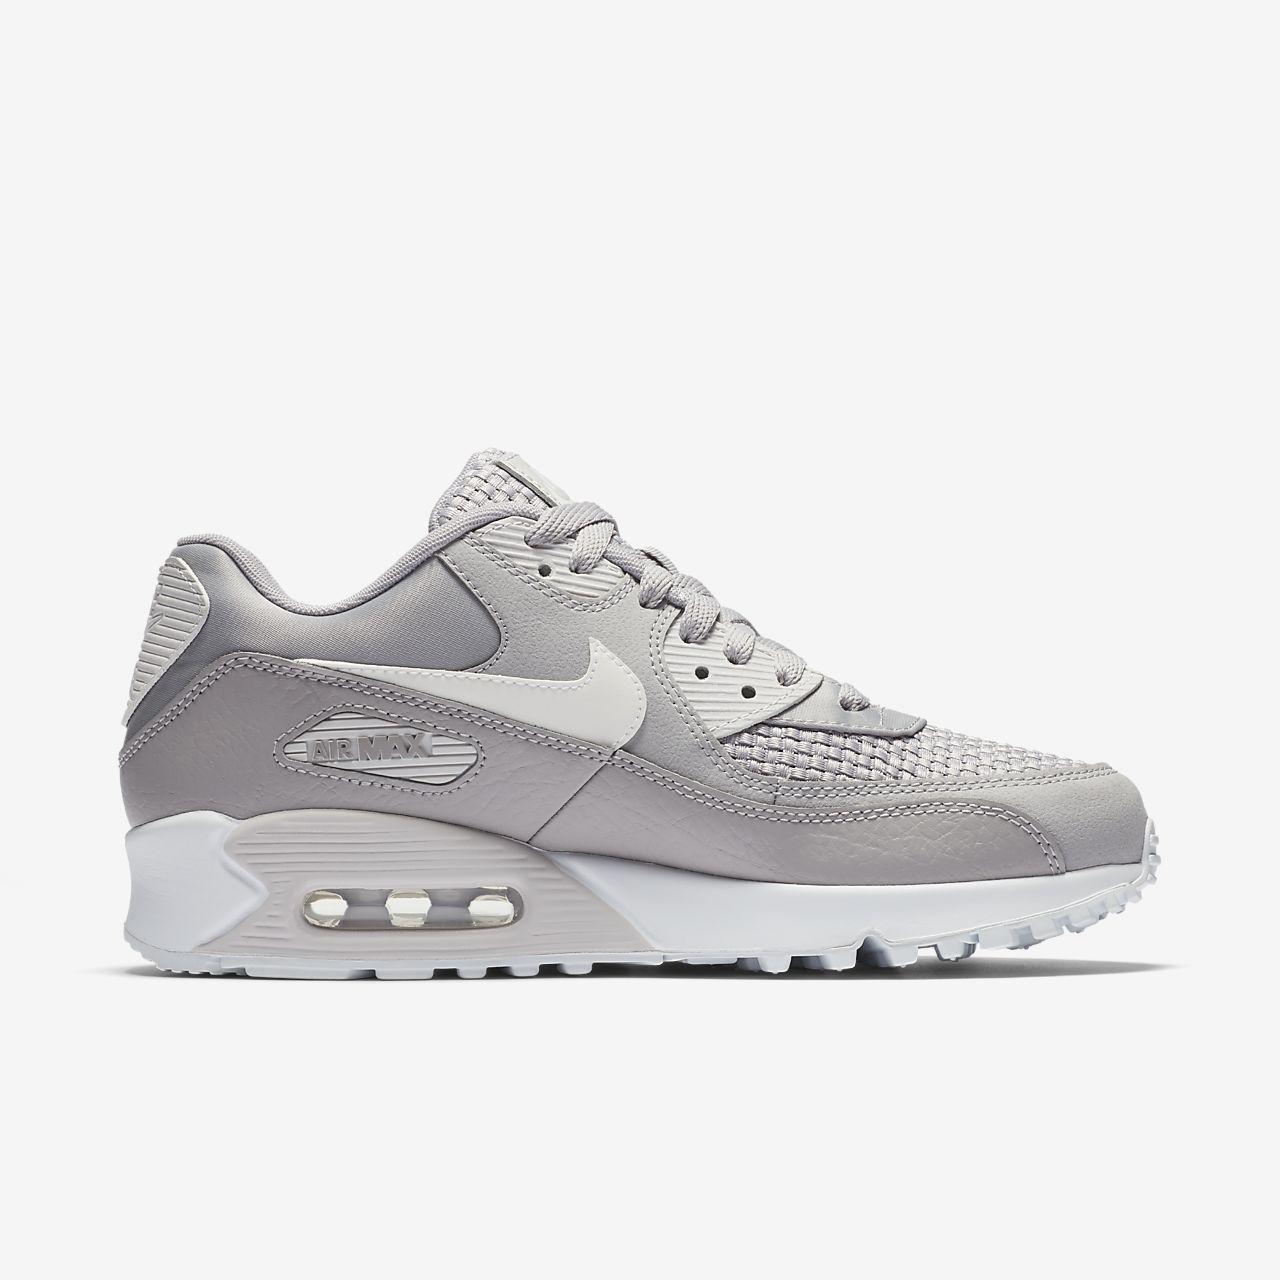 sélection premium 53434 abcac Chaussure Nike Air Max 90 pour Femme. Nike LU